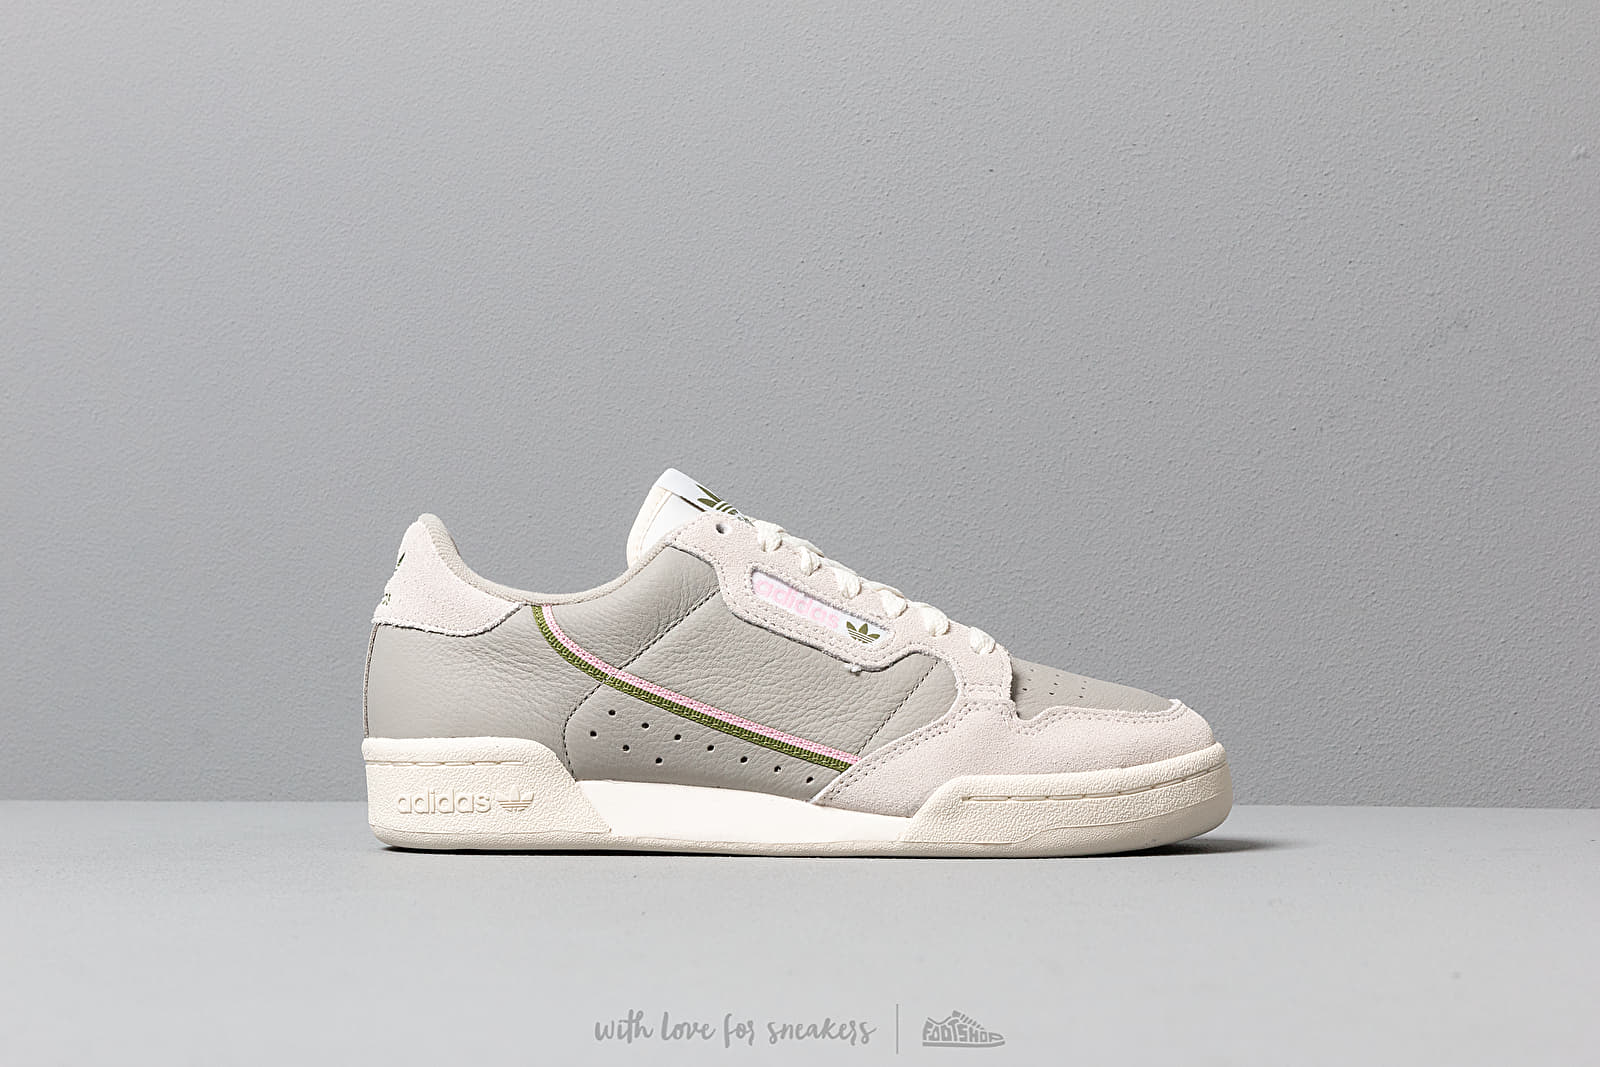 80 White Continental Raw Sesame W Adidas OffFootshop PkXuOZiT